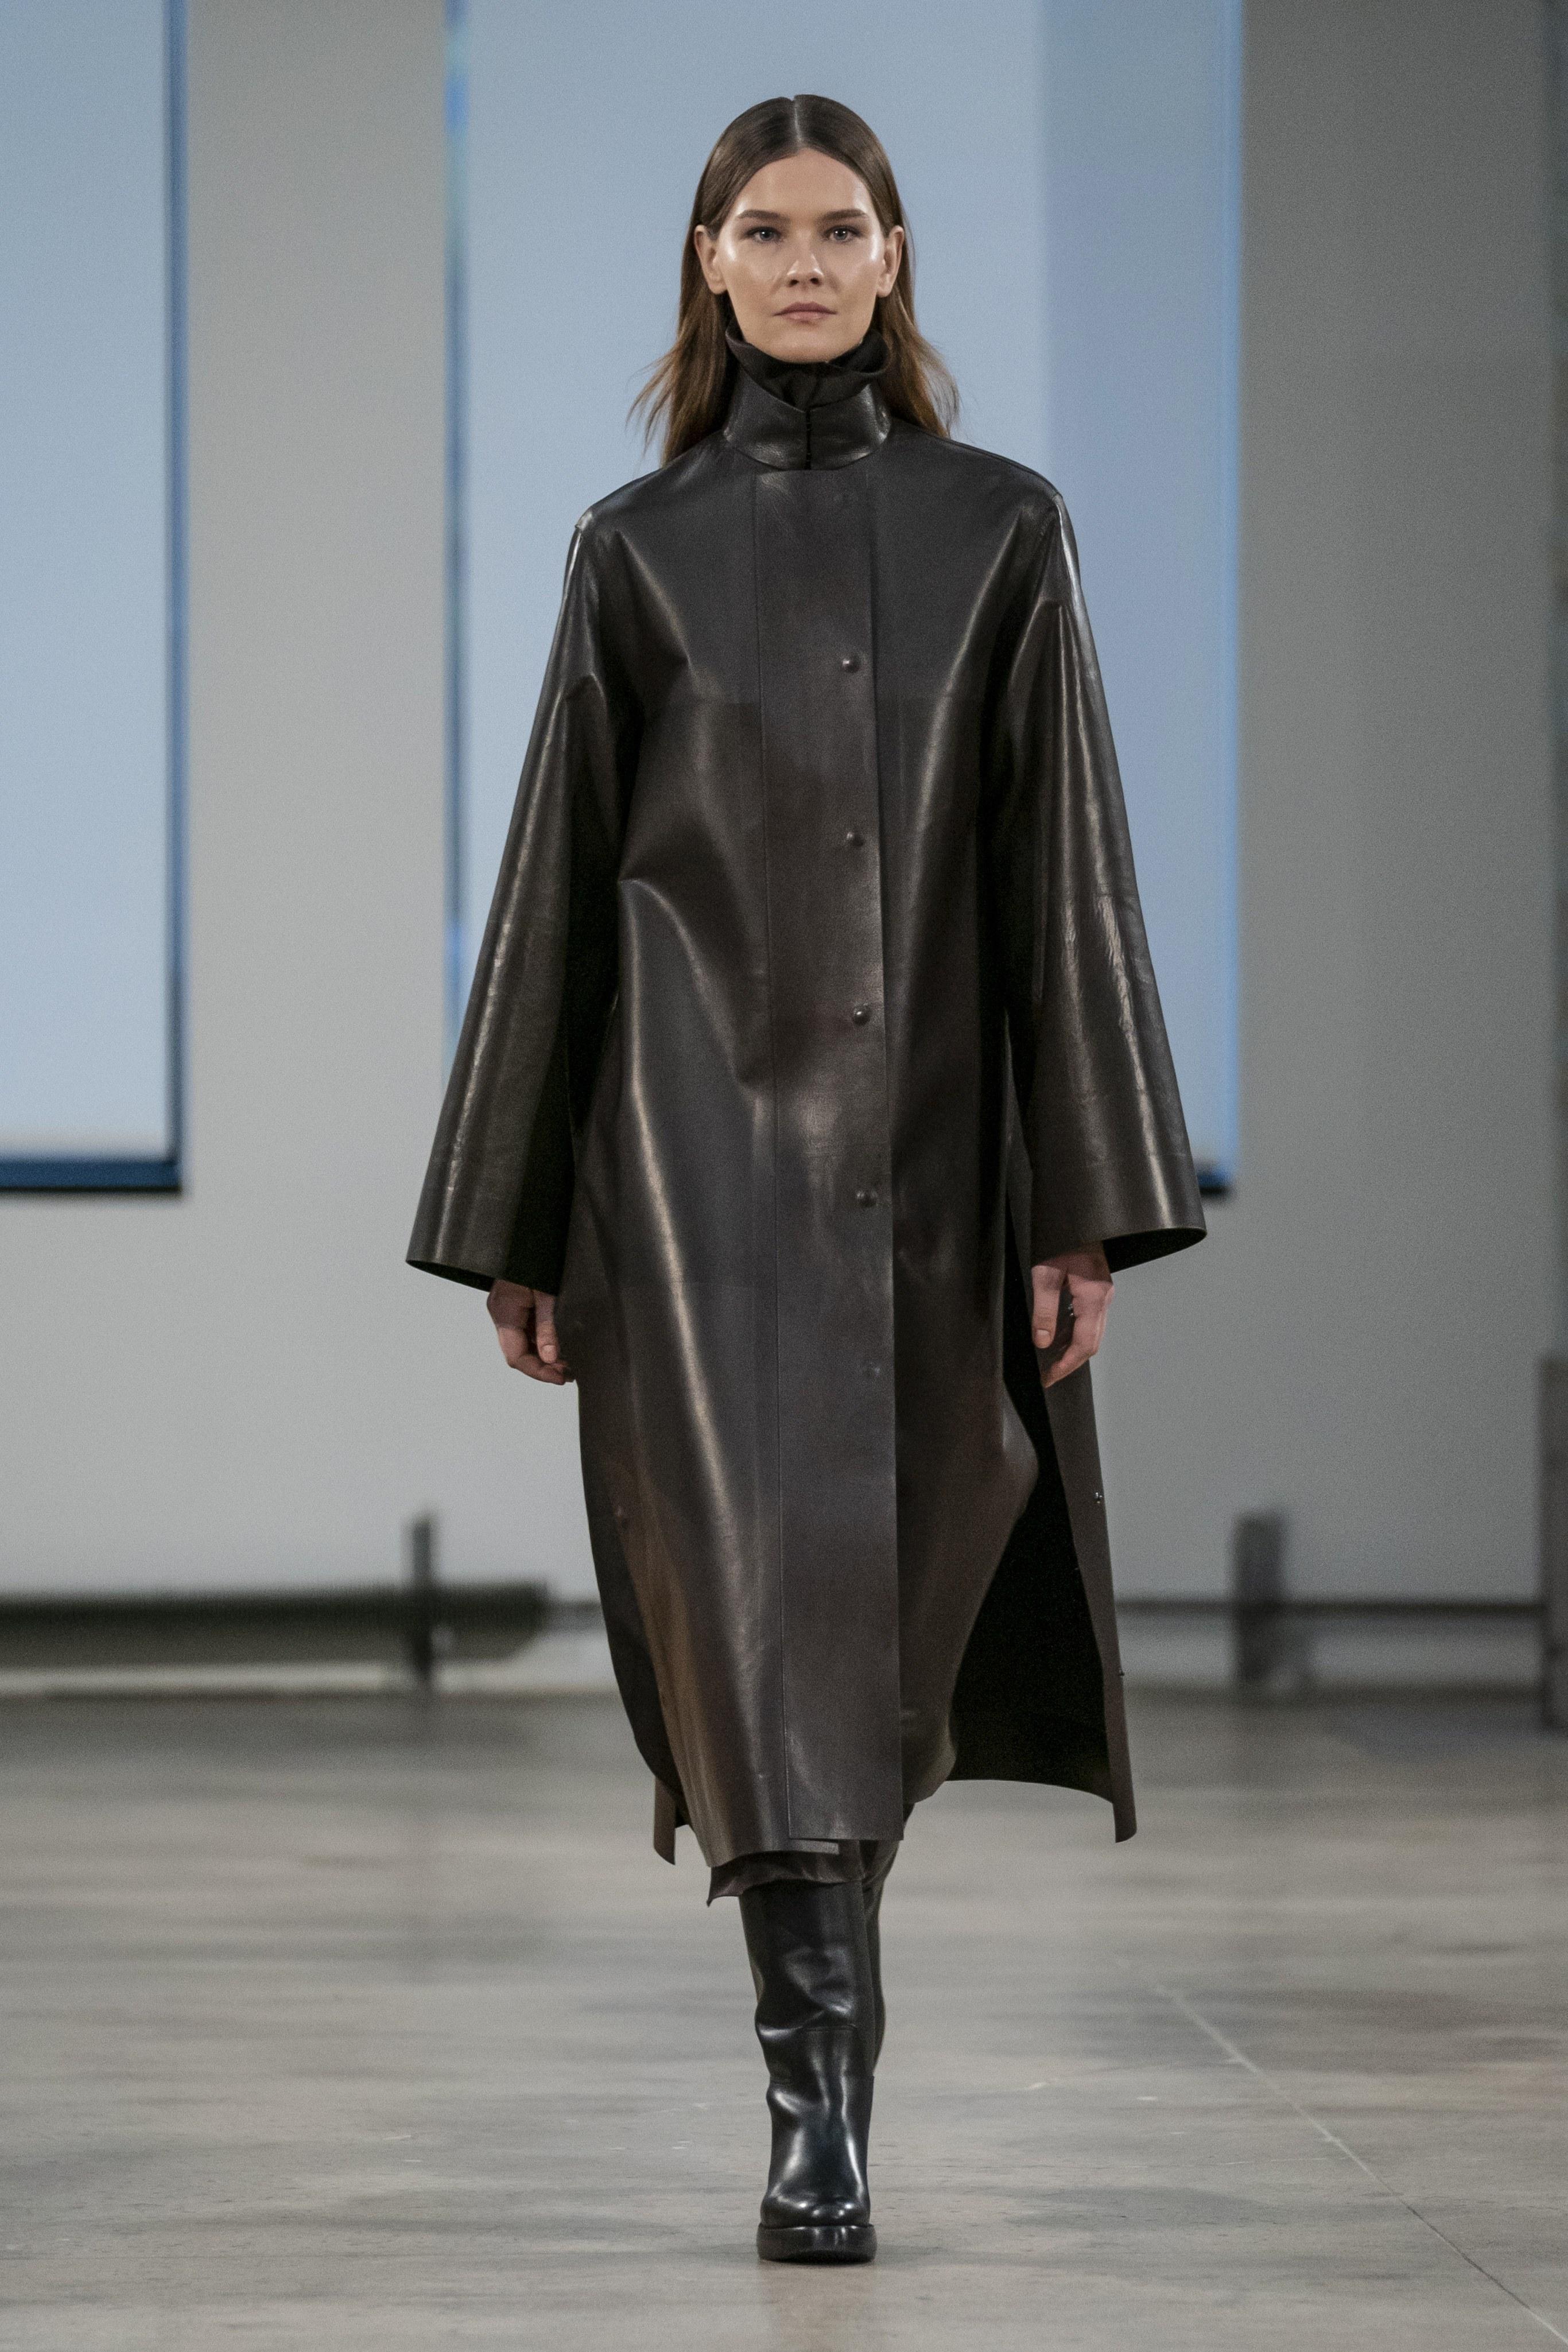 00018-The-Row-Fall-2019-ready-to-wear